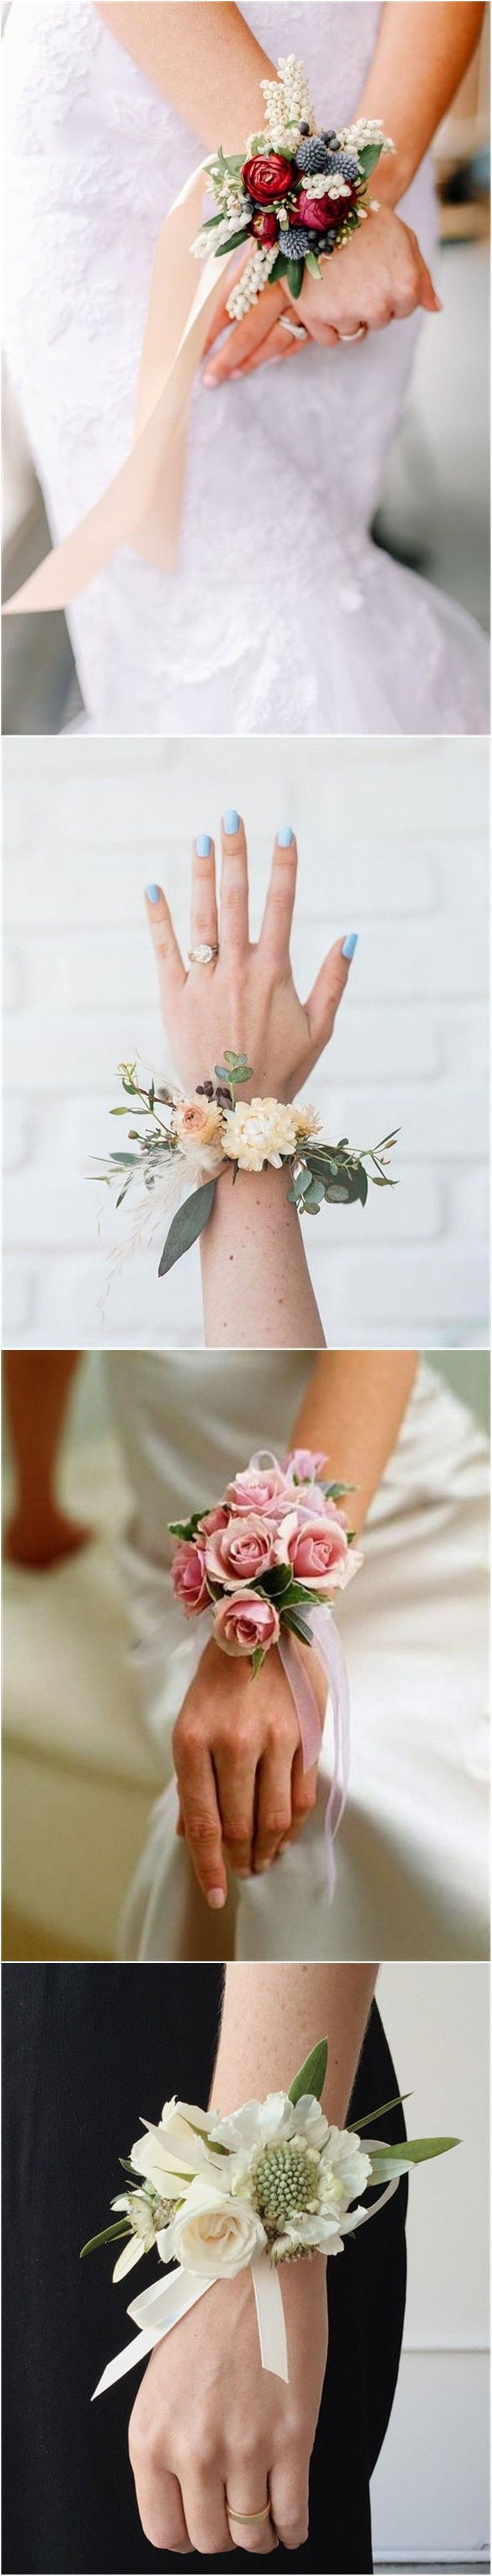 807 best FLOWERS & WEDDING images on Pinterest | Wedding decor ...